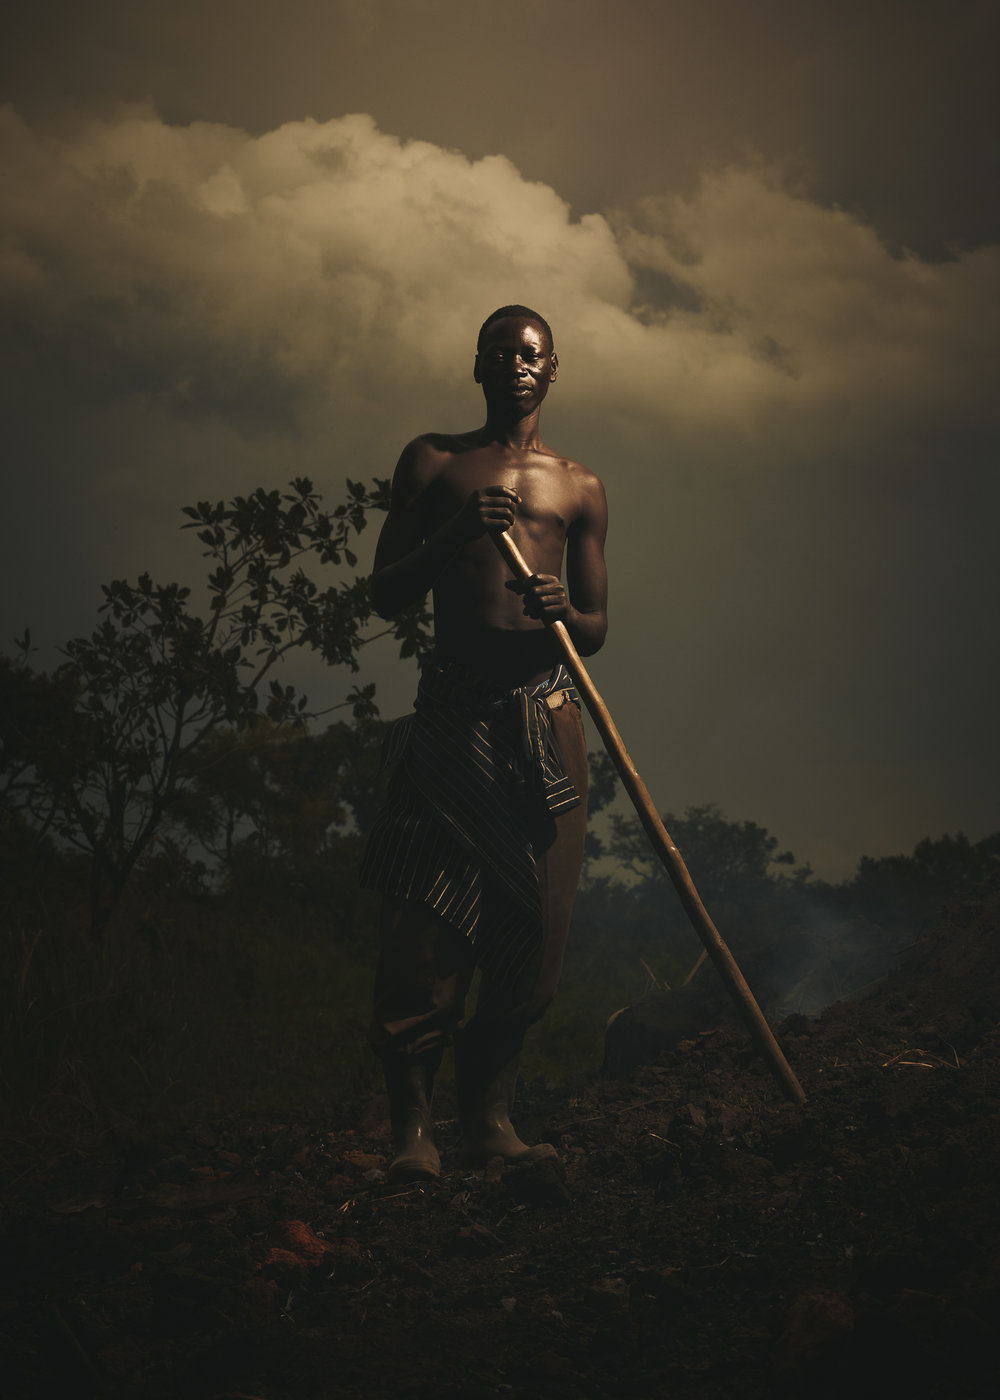 Exile_Uganda-007990-Edit-Edit.jpg